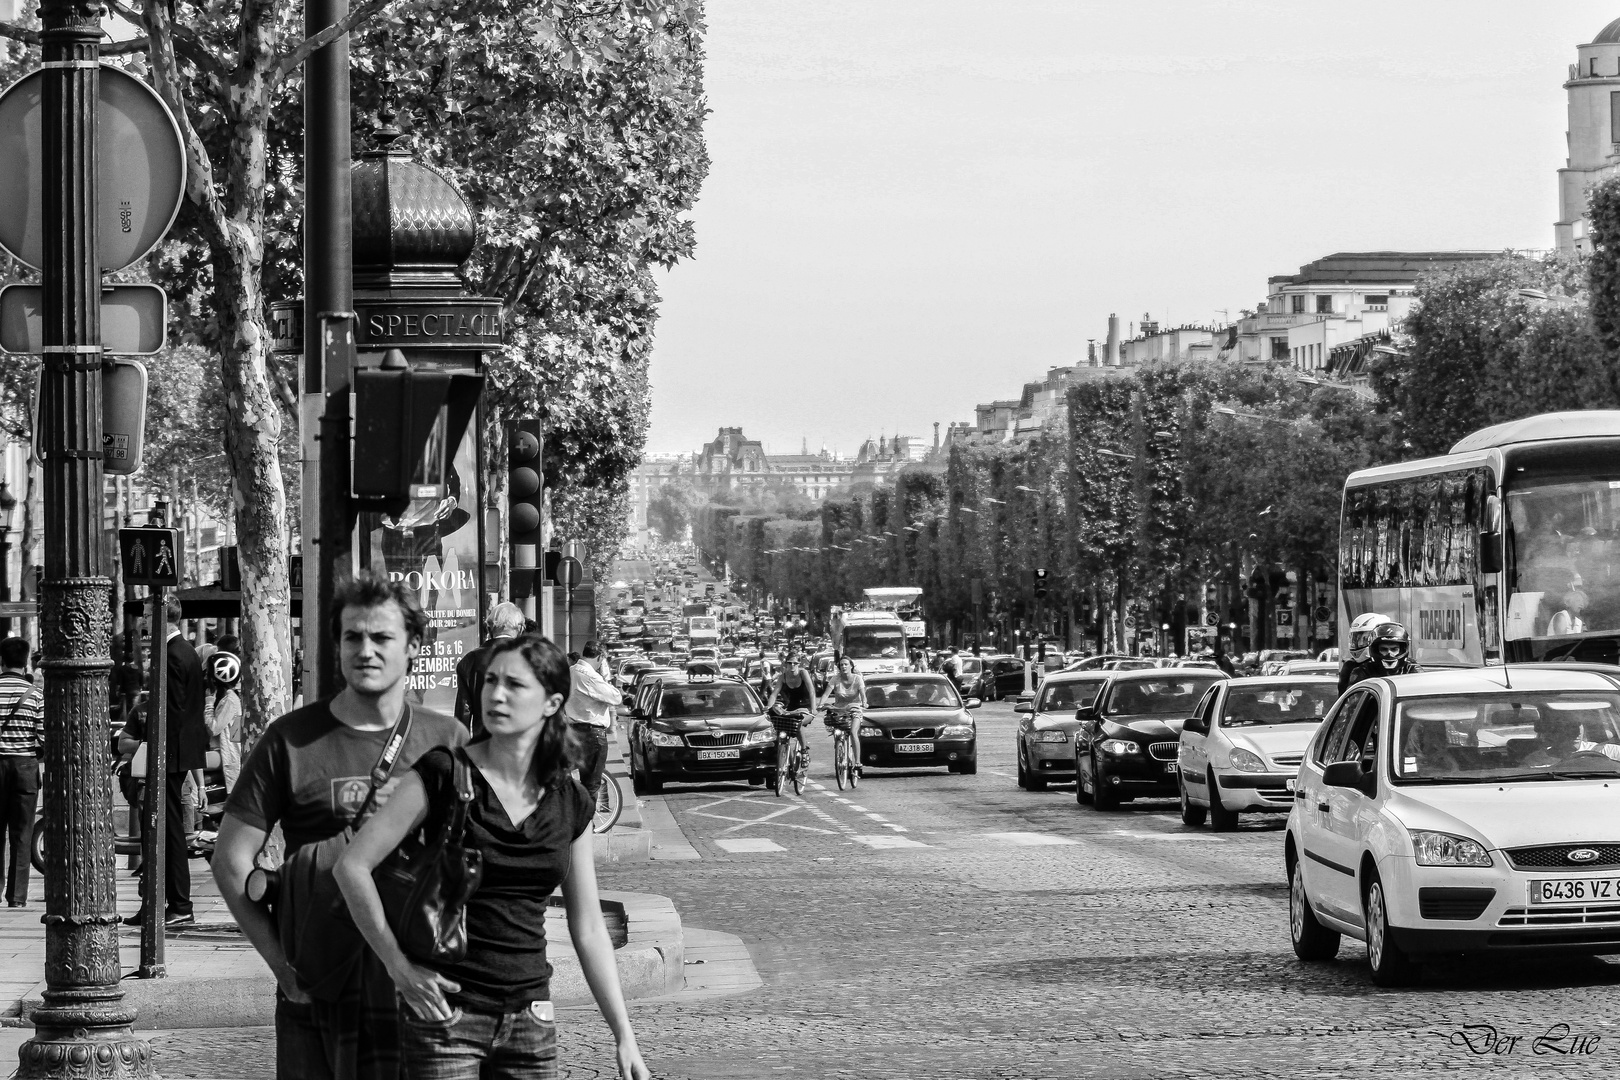 Peace-Zeichen, grünes Ampelmännchen und Paris Spectacle